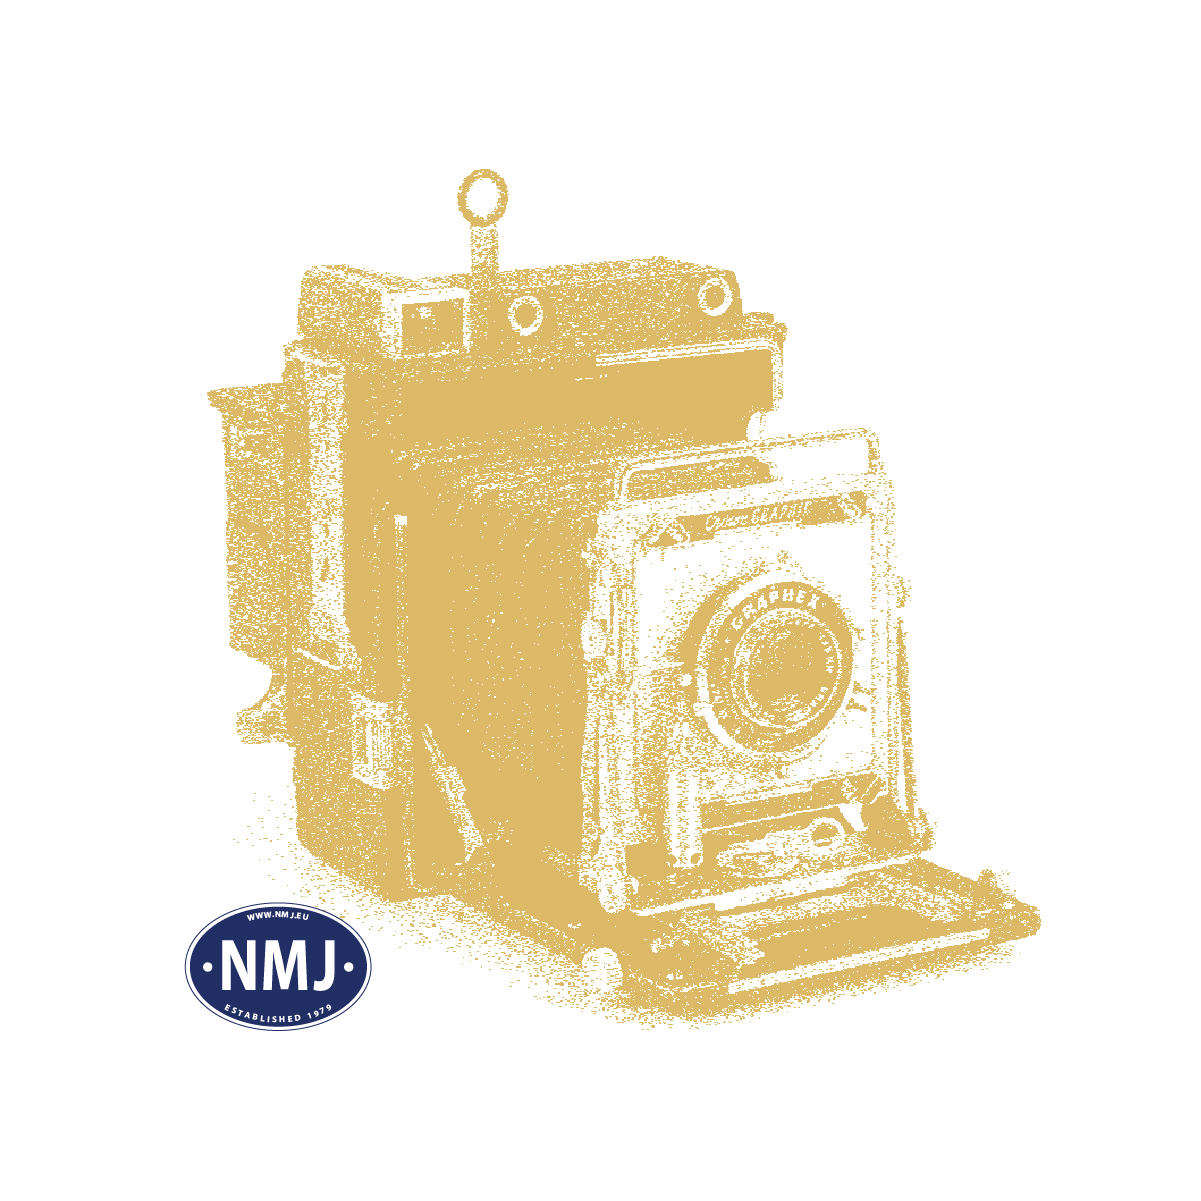 NMJB1120 - NSB Pantograf